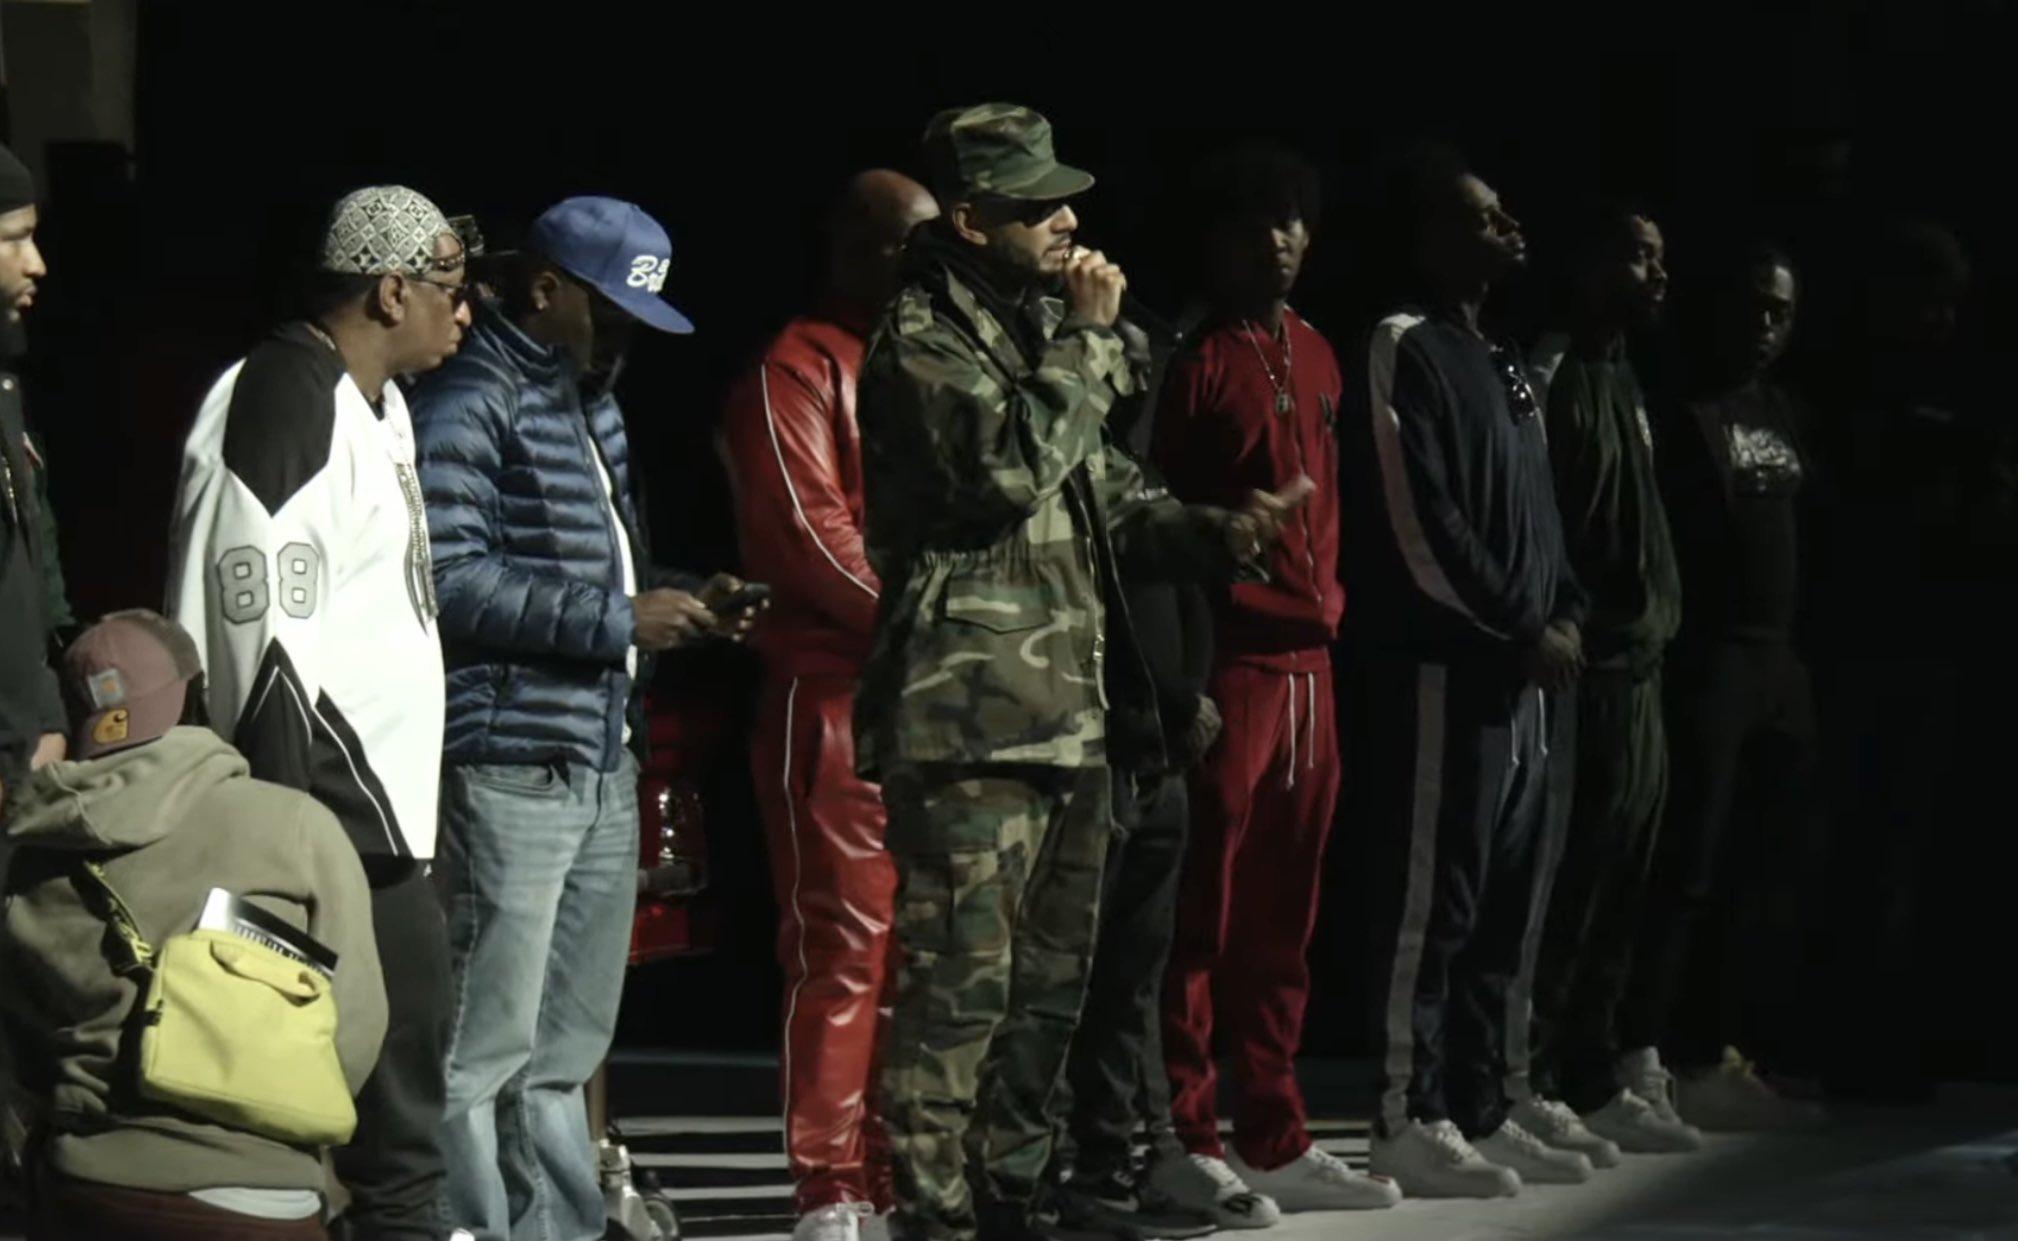 Swizz Beatz and Ruff Ryders at DMX memorial service